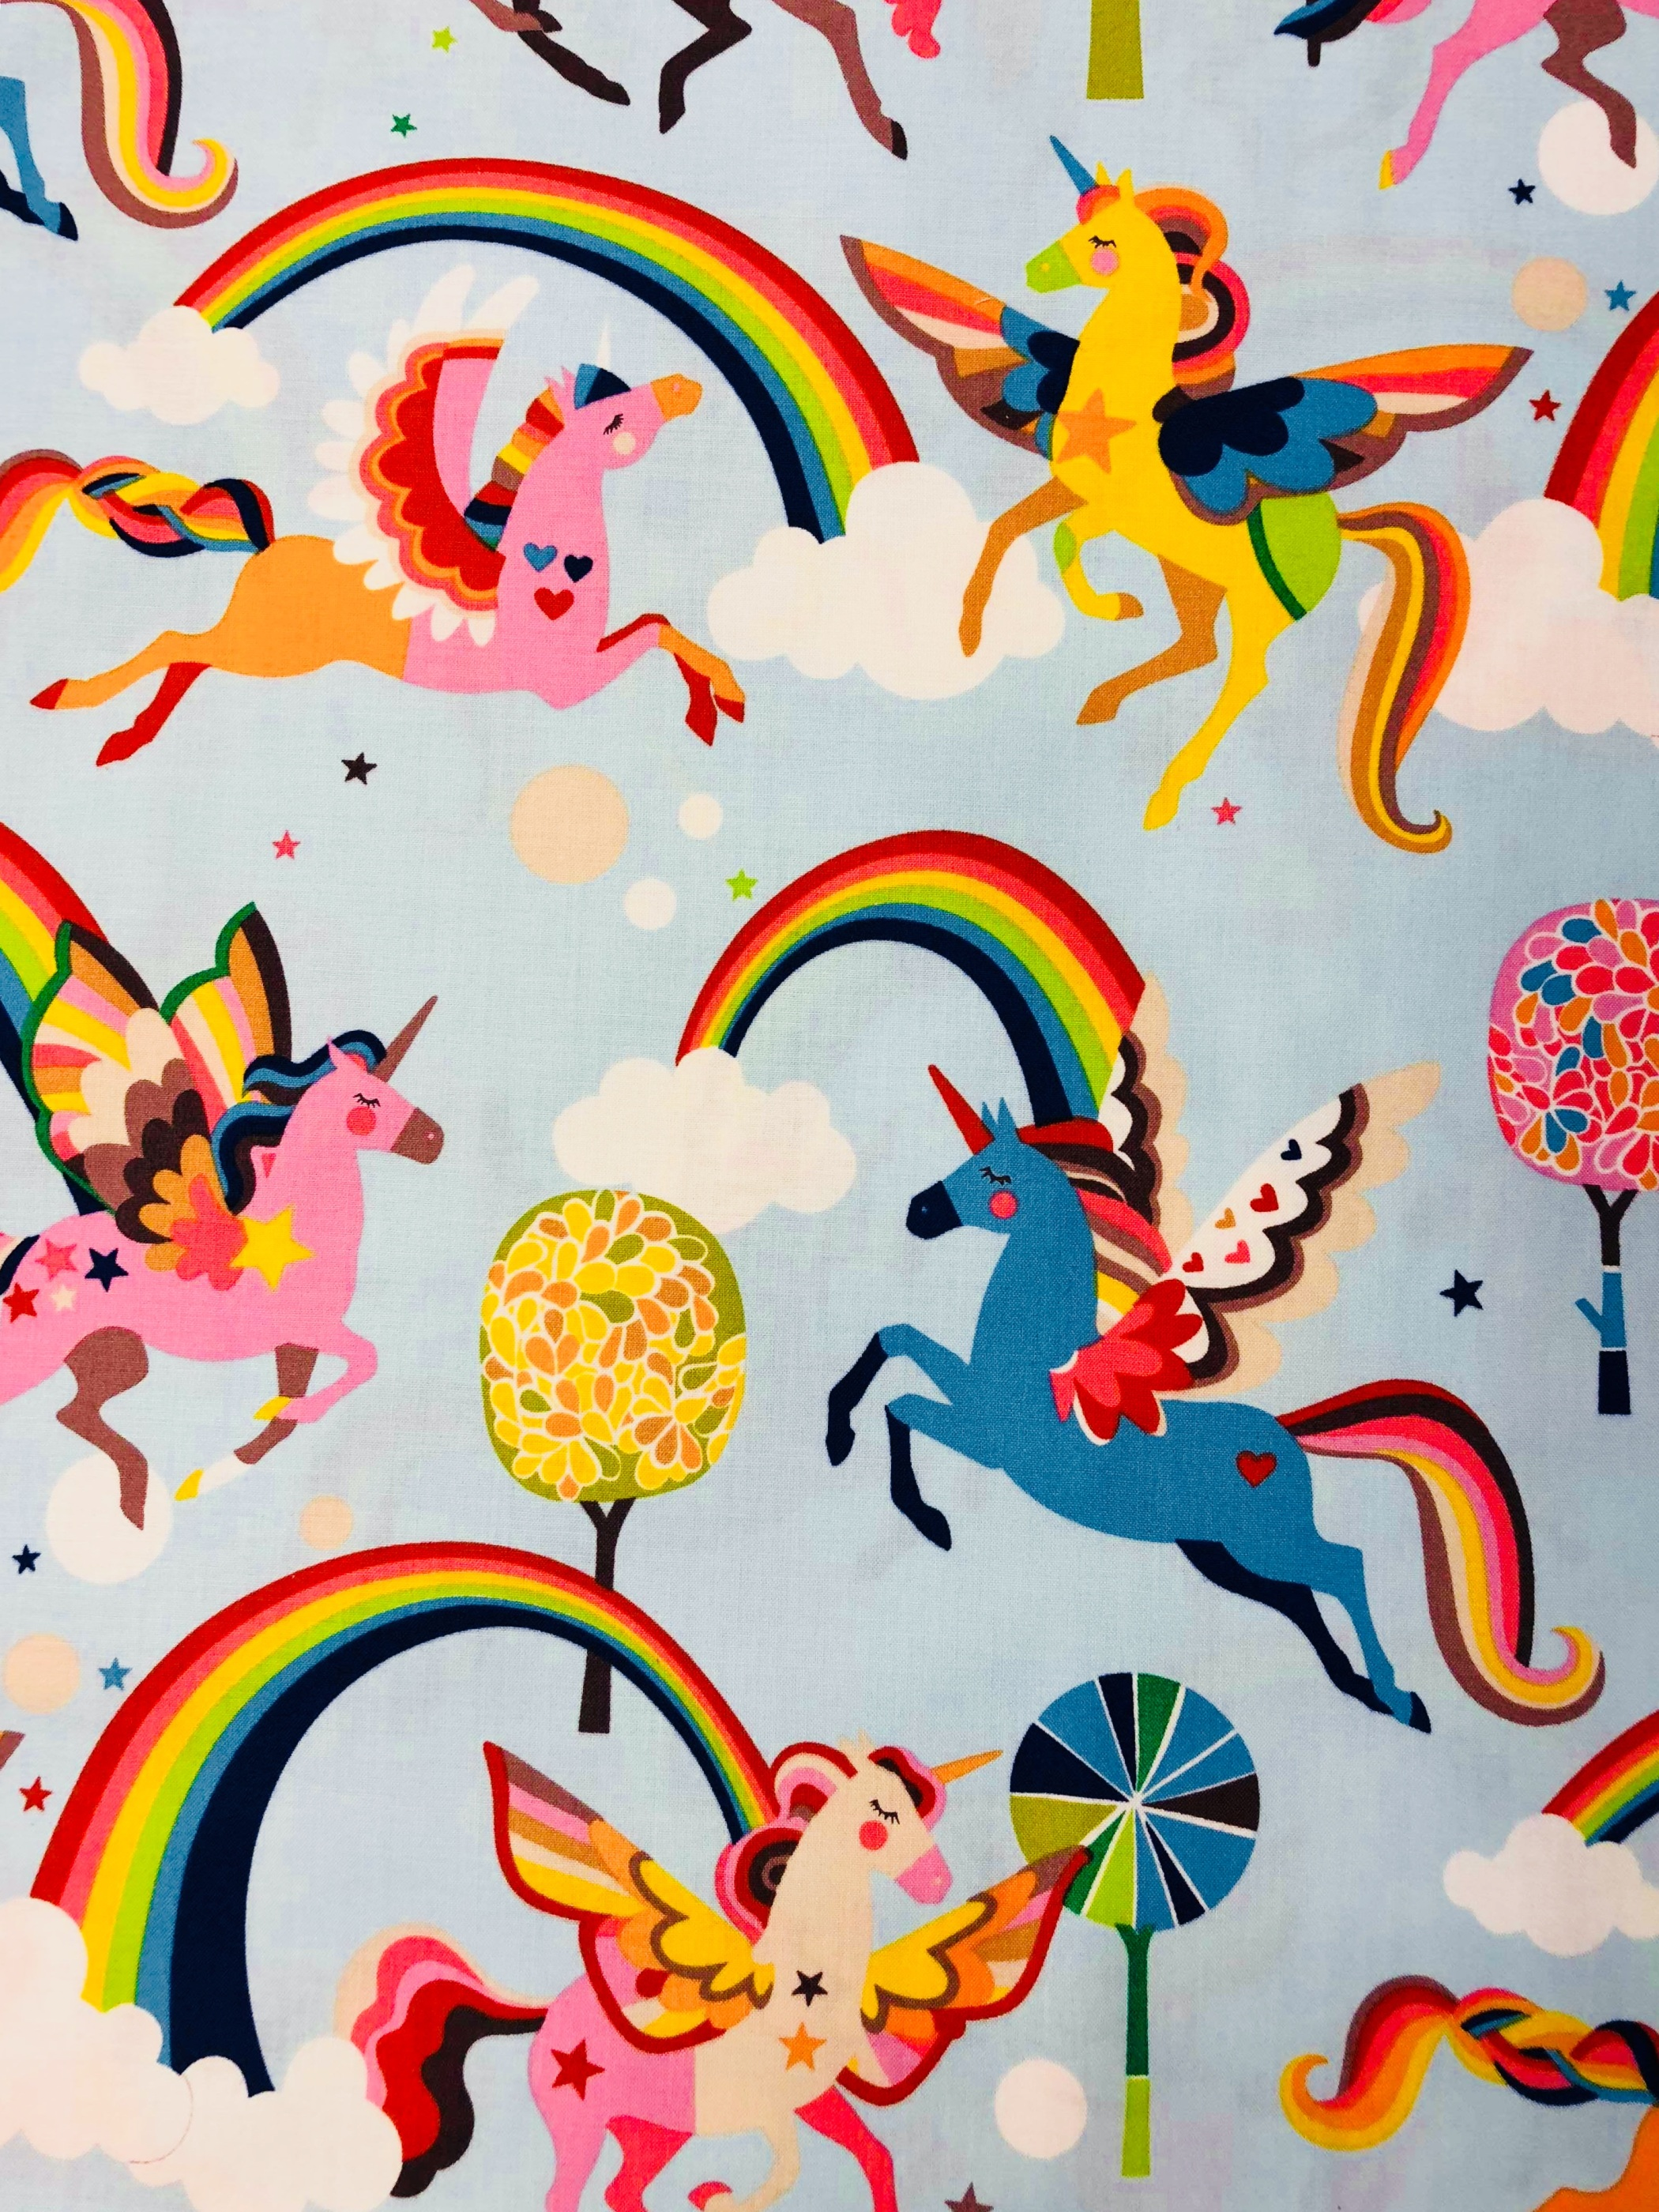 Rainbow unicorn enhörning regnbåge bomull bomullstyg metervara Tyglust Laholm barntyg